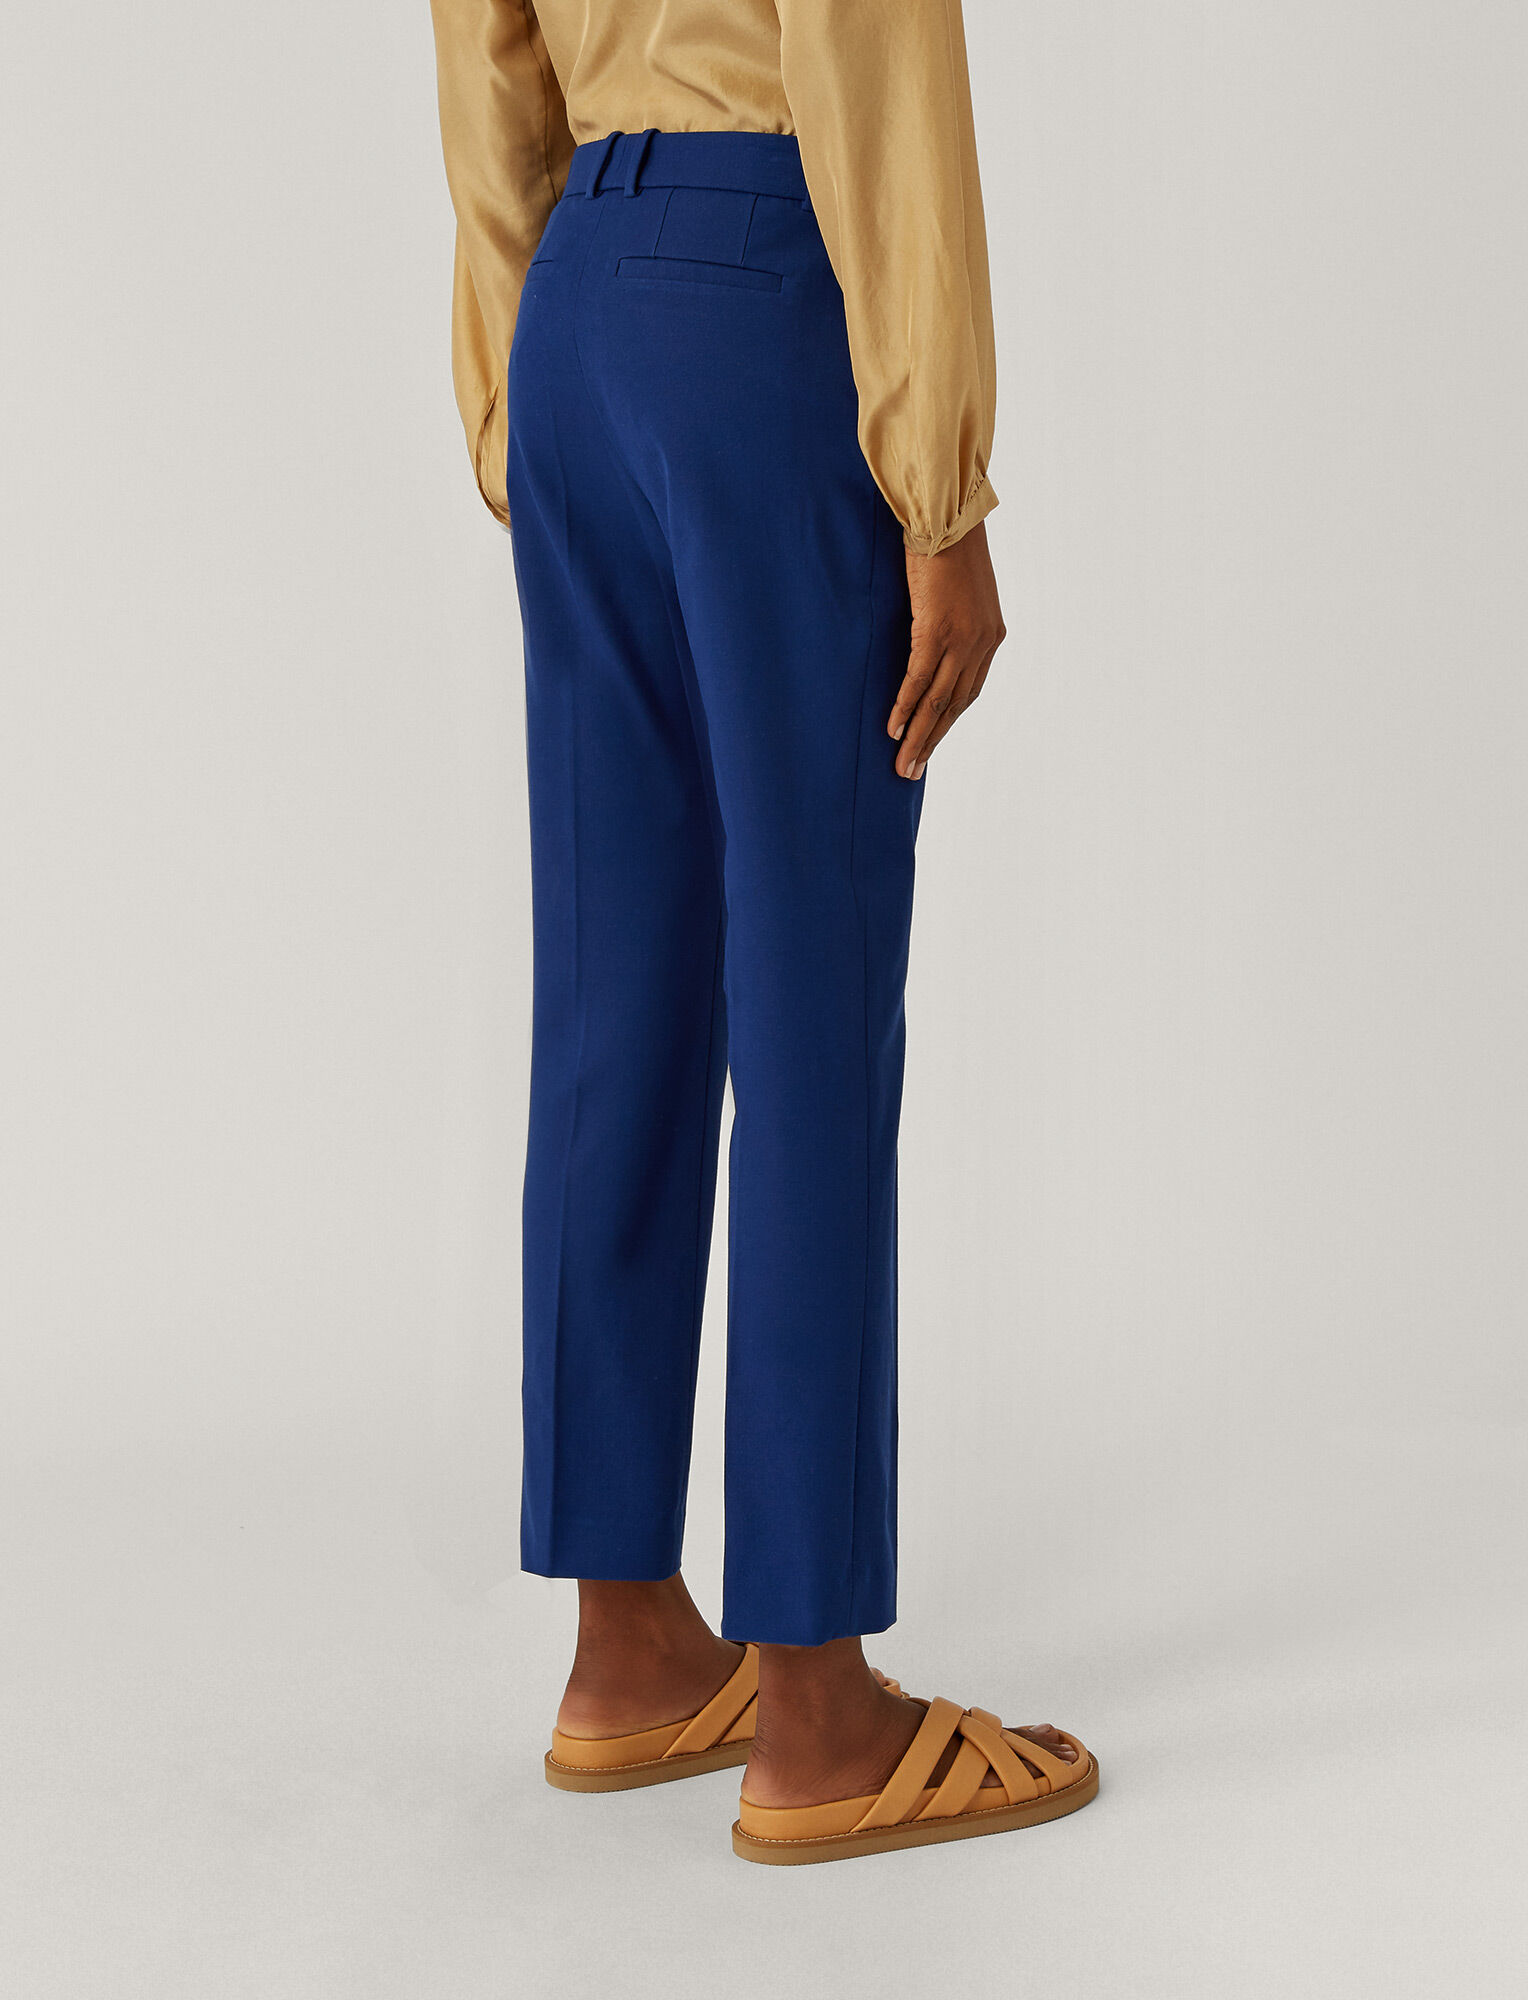 Joseph, Coleman Gabardine Stretch Trousers, in KLEIN